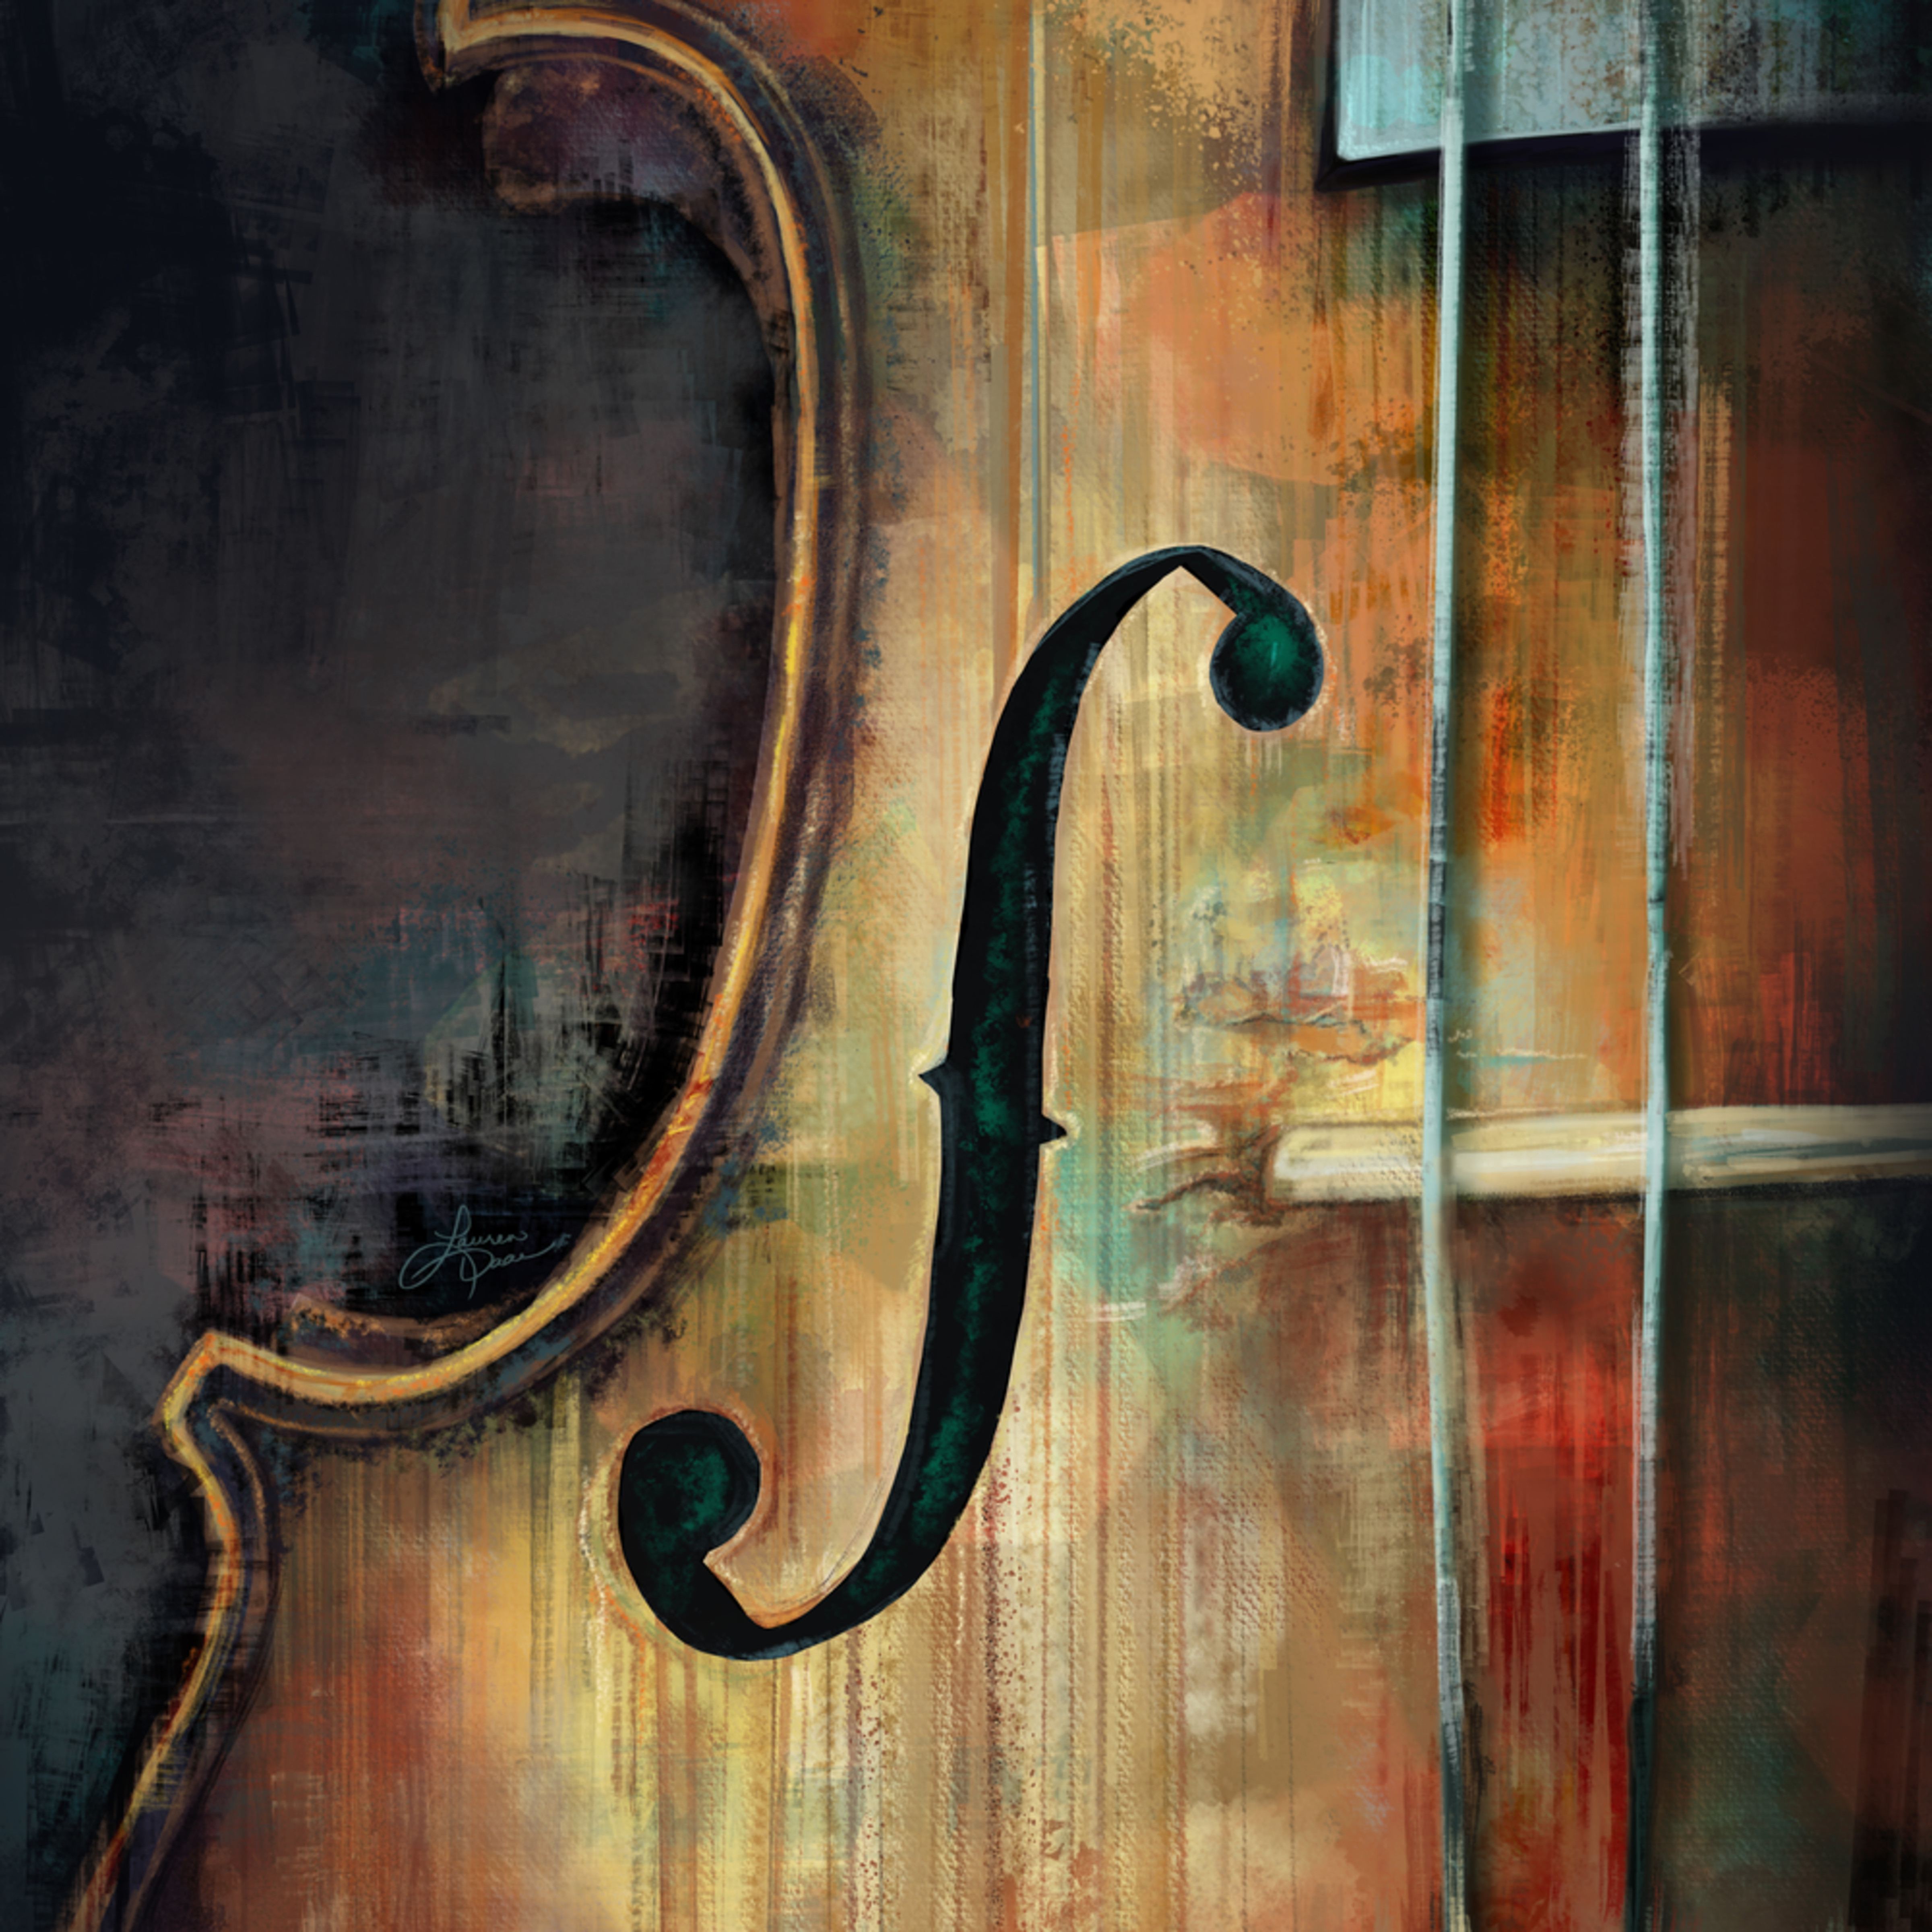 Violin cozf4m